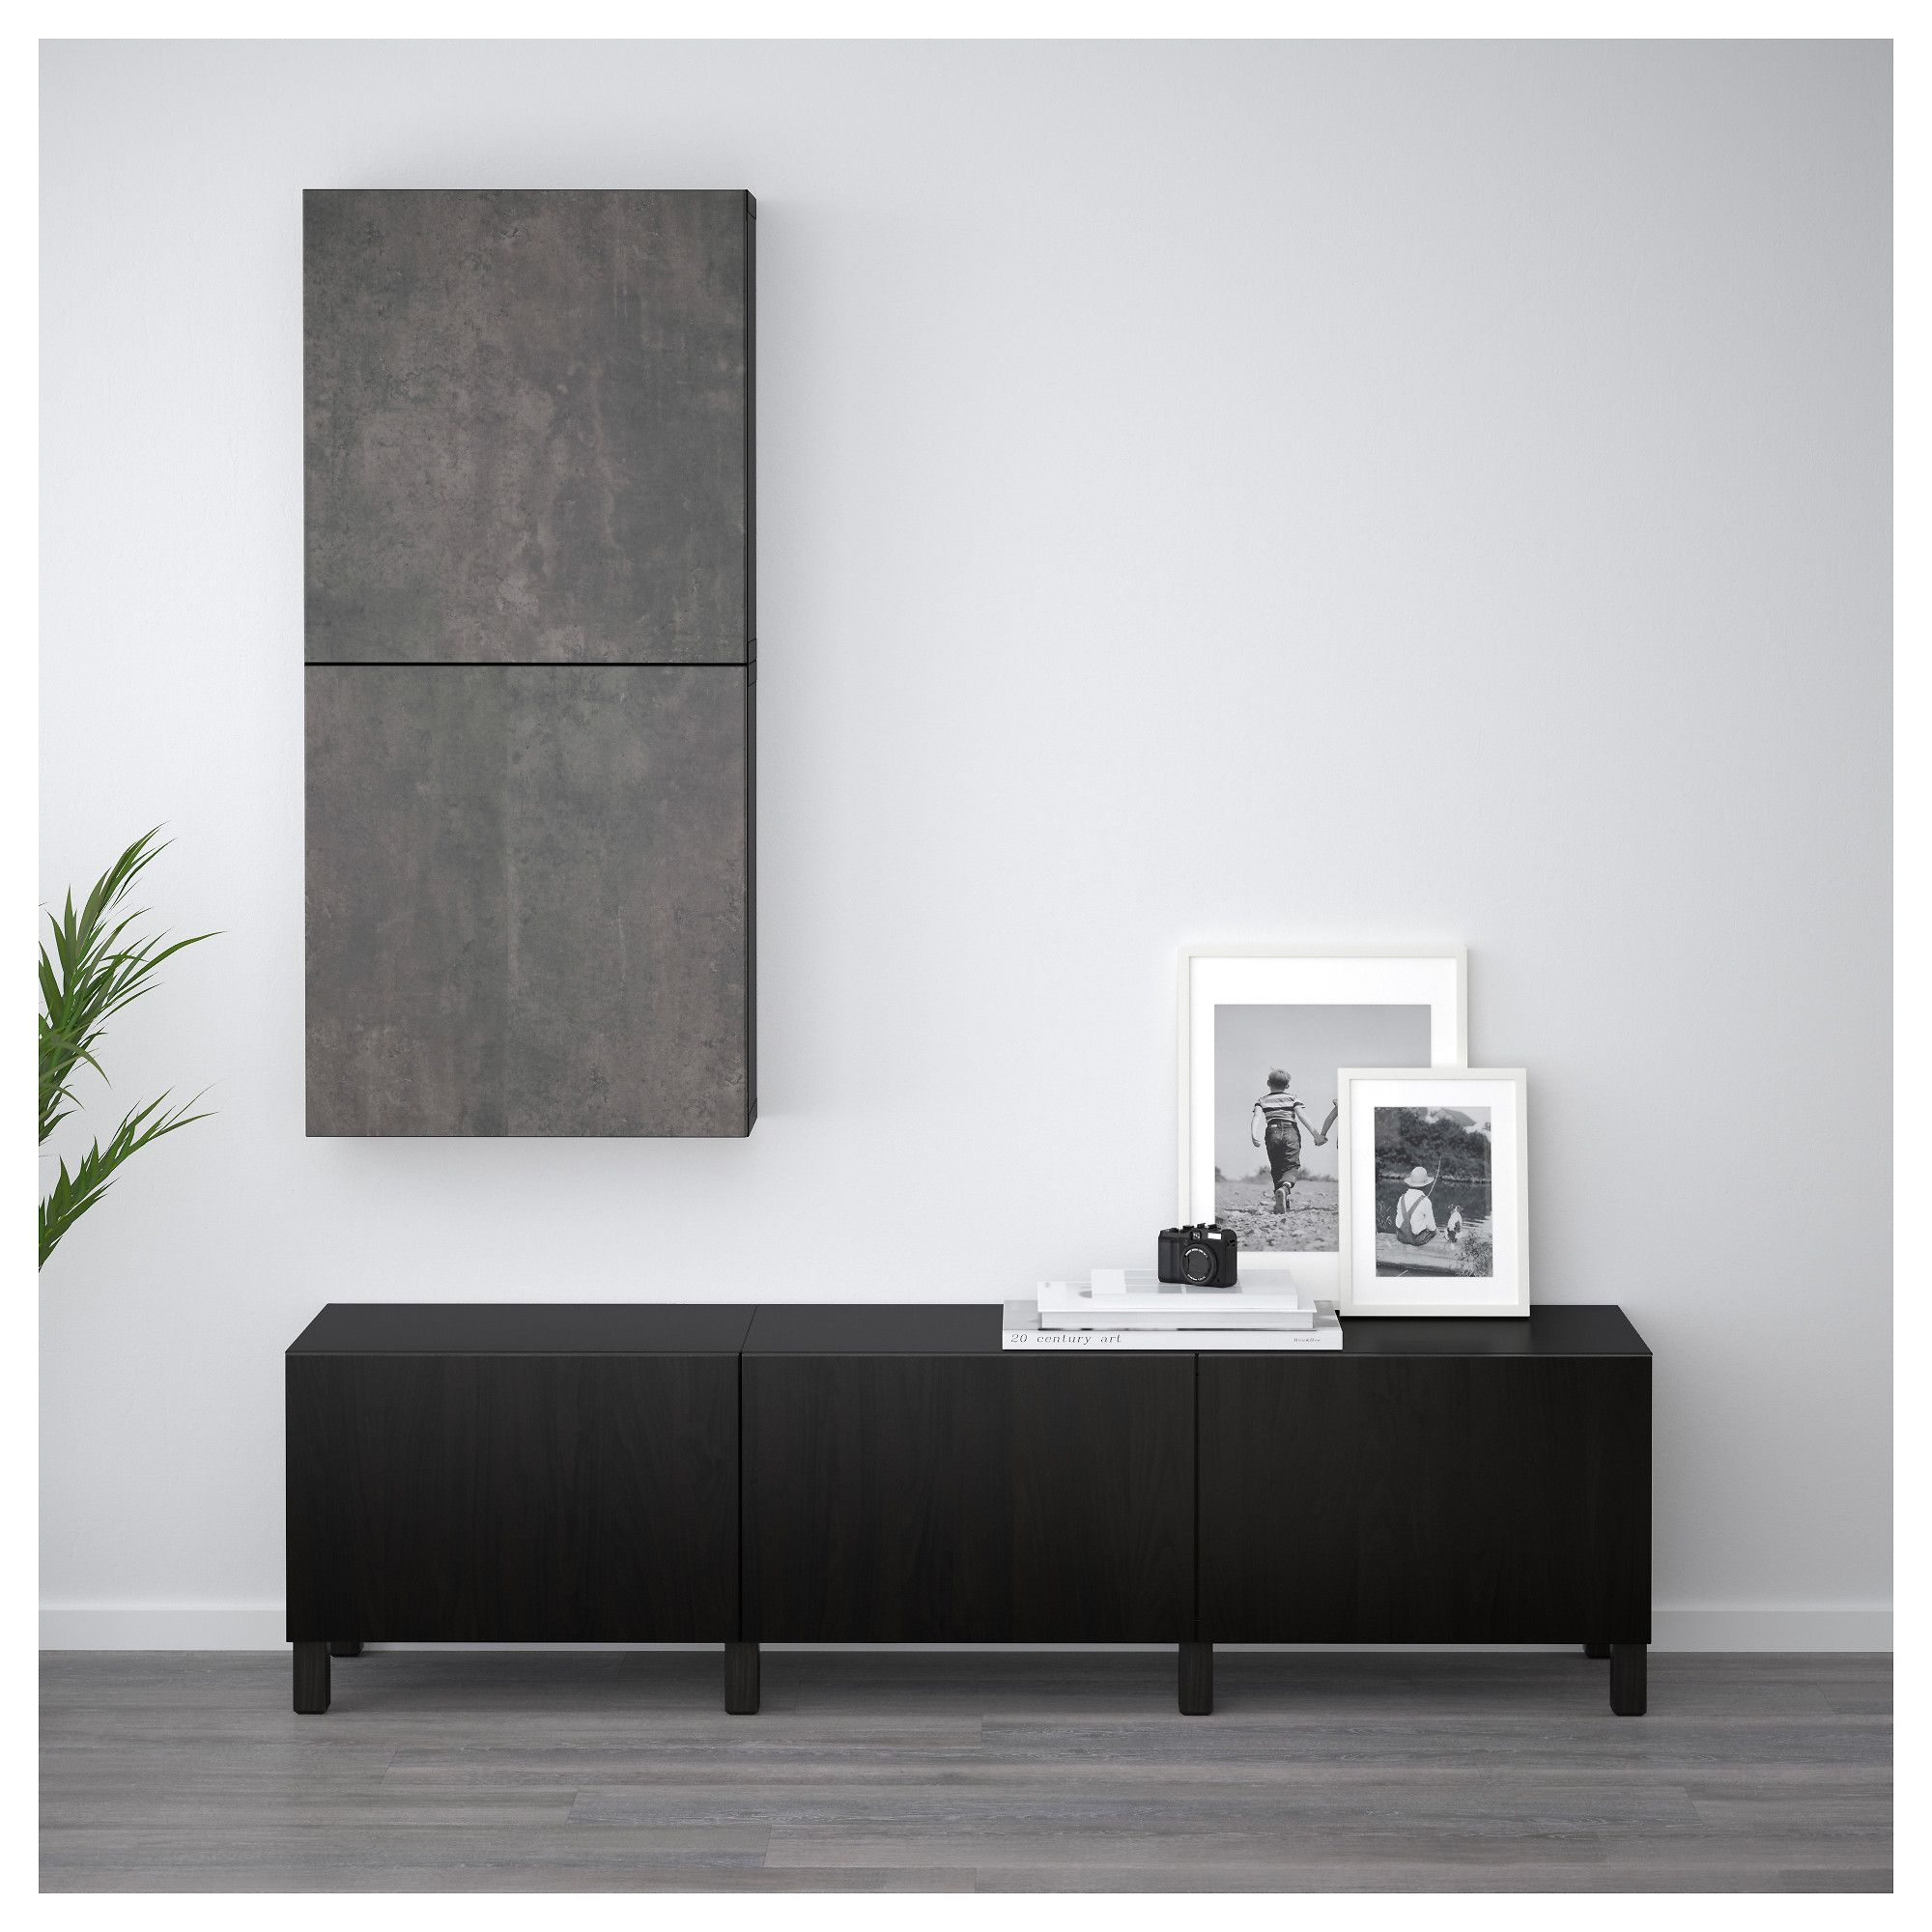 Ikea Best 197 Wall Cabinet With 2 Doors Black Brown